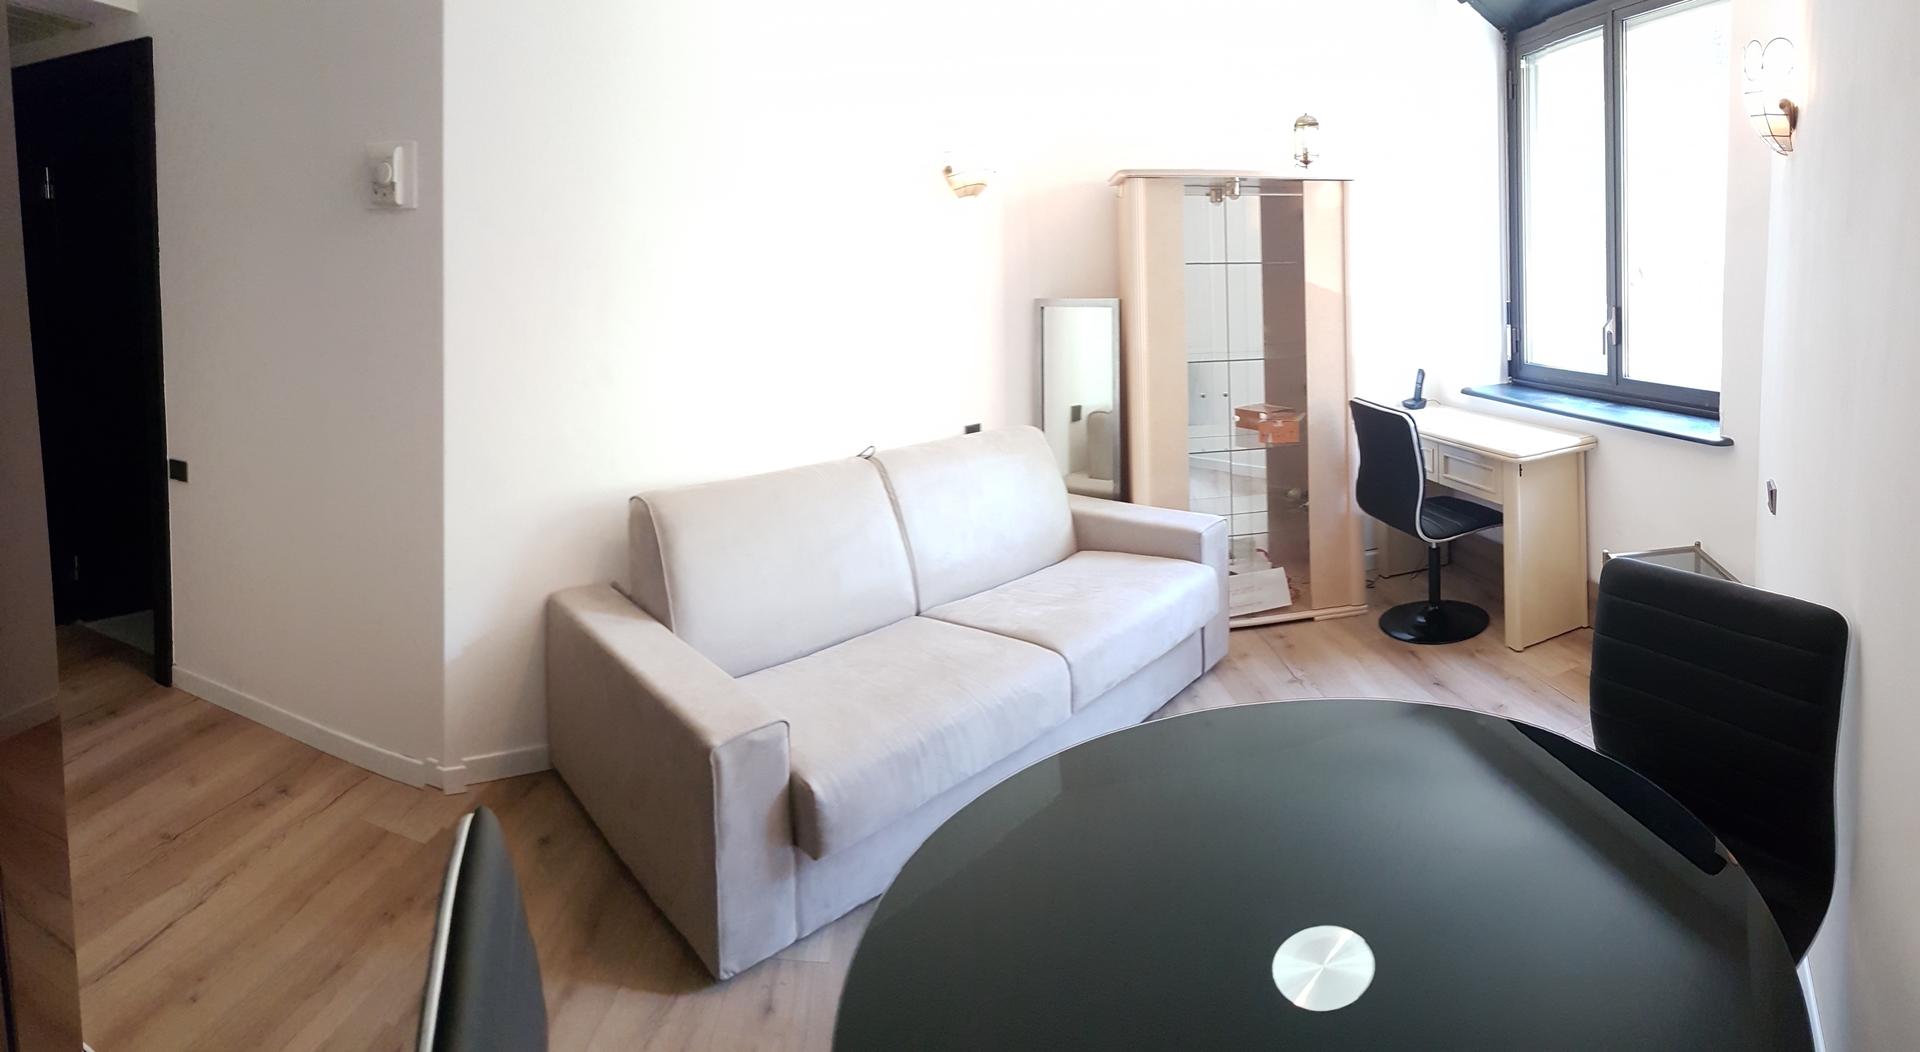 STUDIO  MIXED-USE IN PARC SAINT ROMAN - Uffici in vendita a MonteCarlo